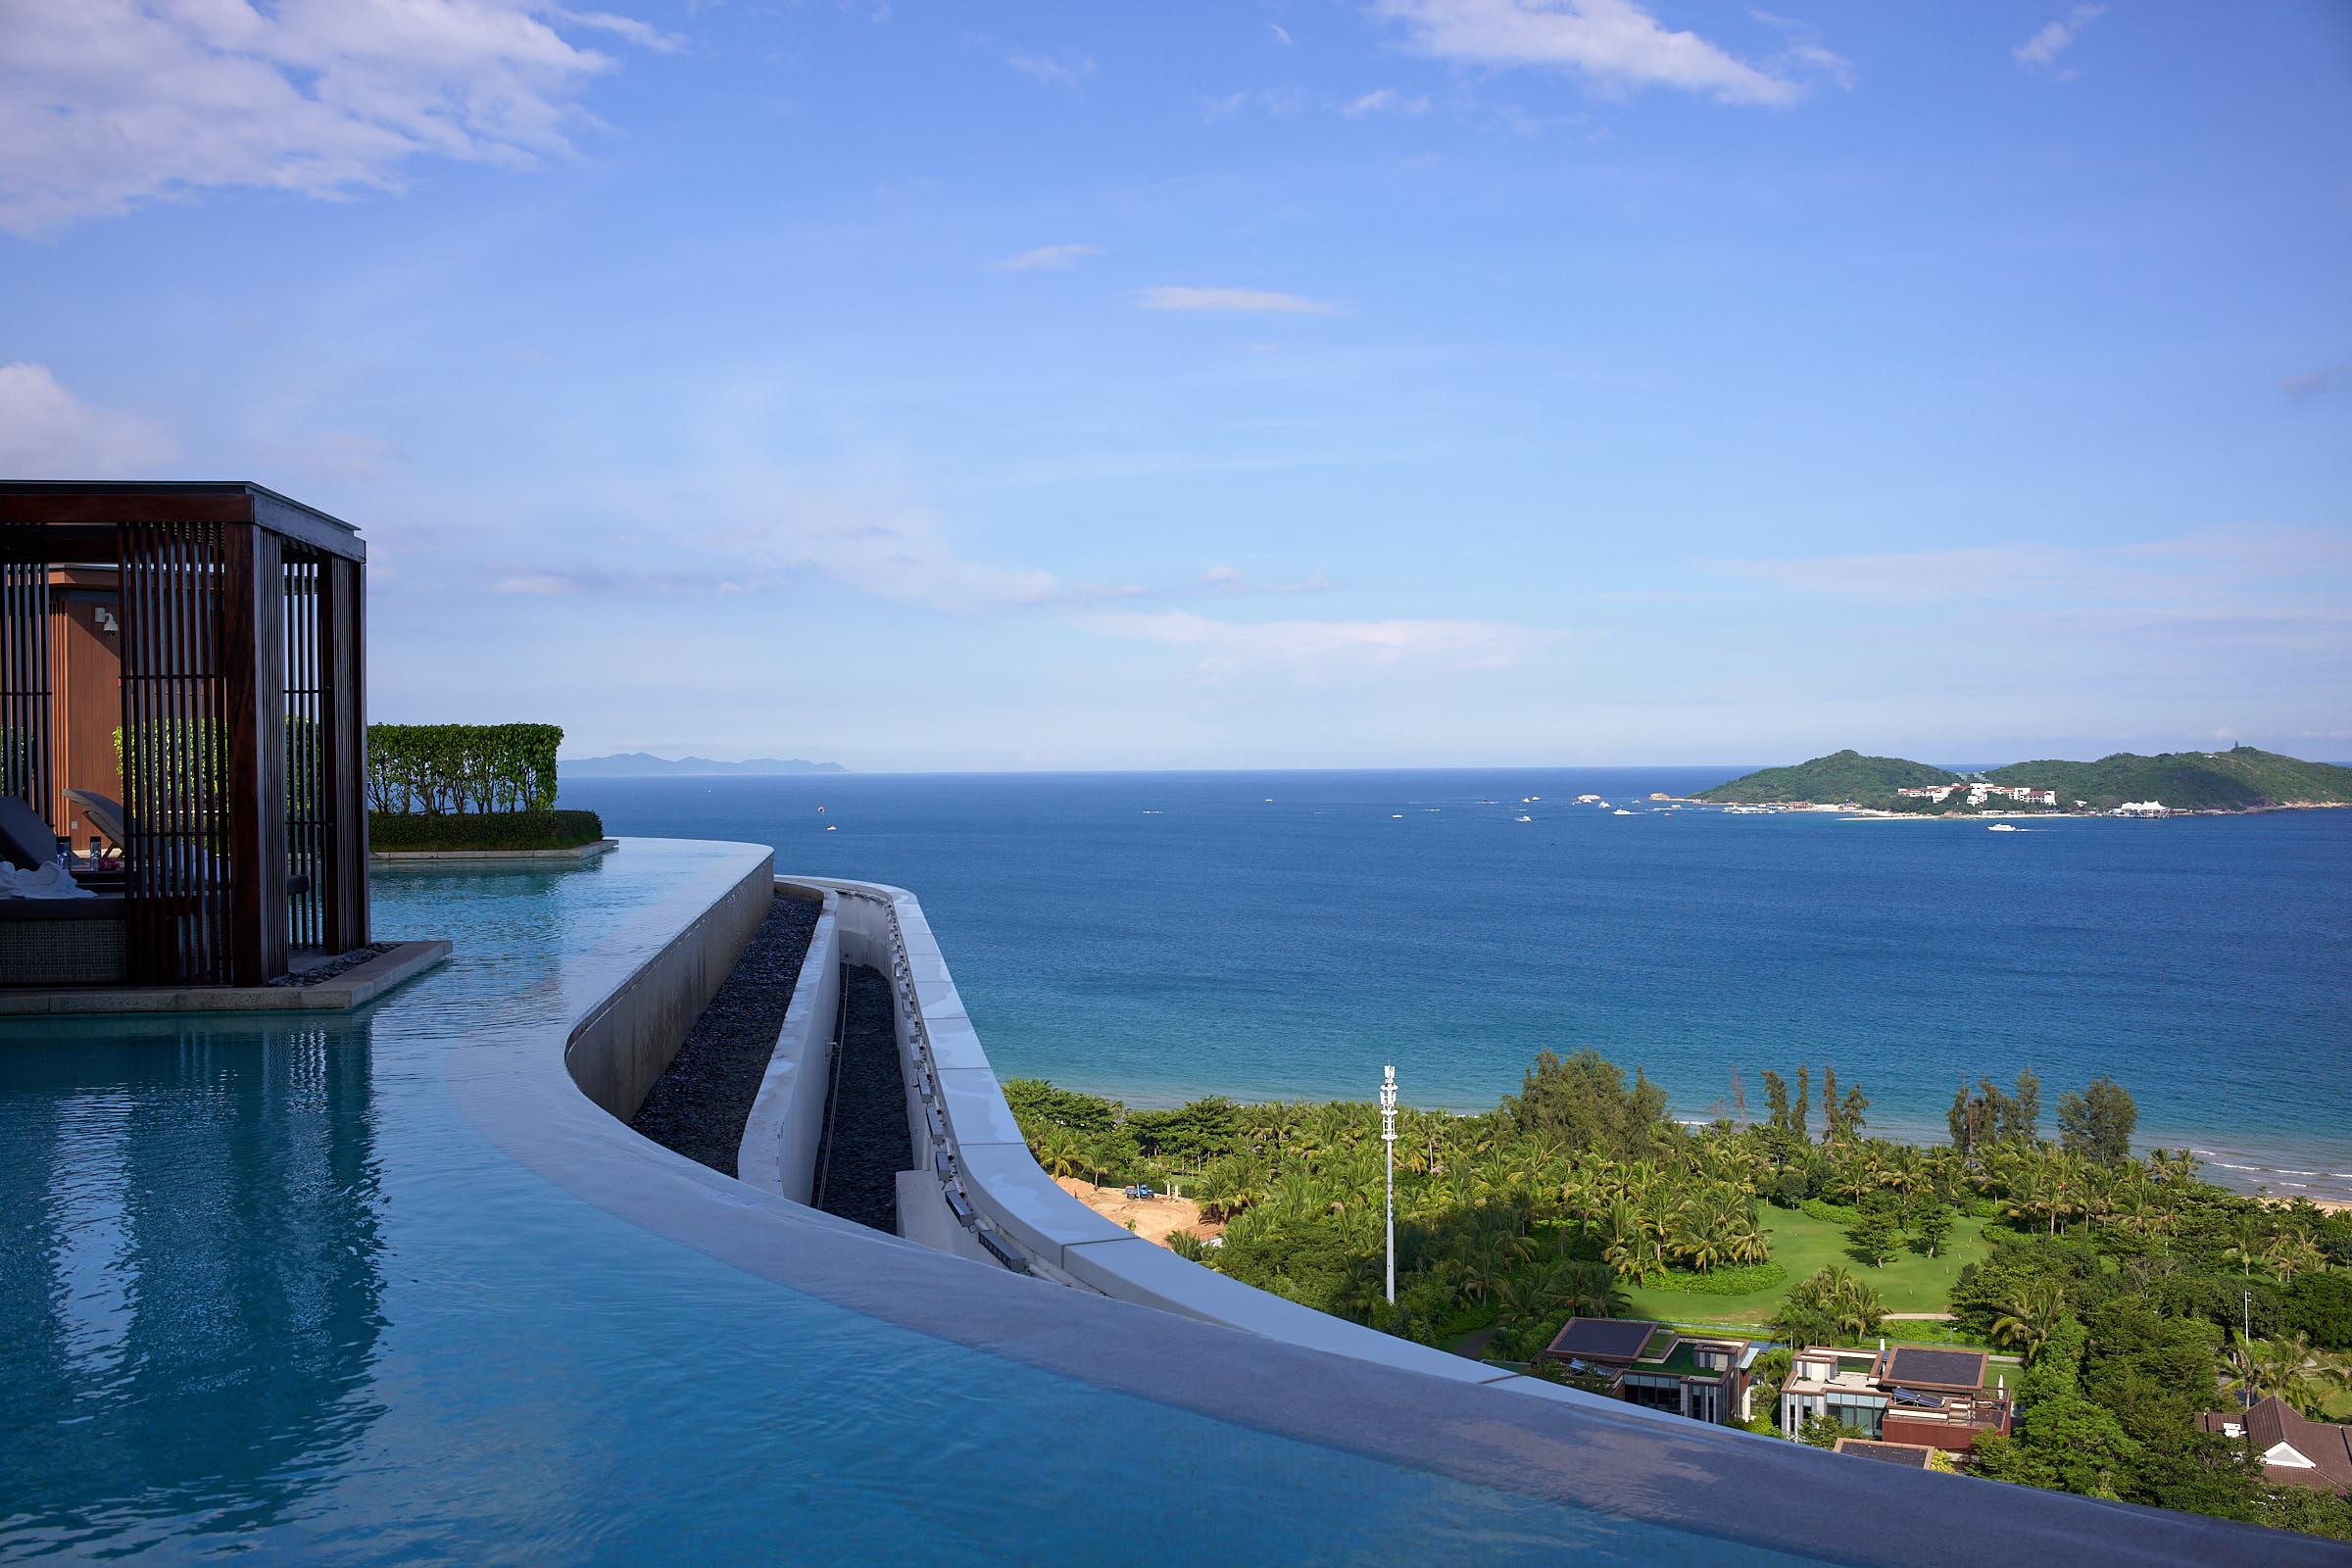 Rosewood Hotel pool Sanya, Chain